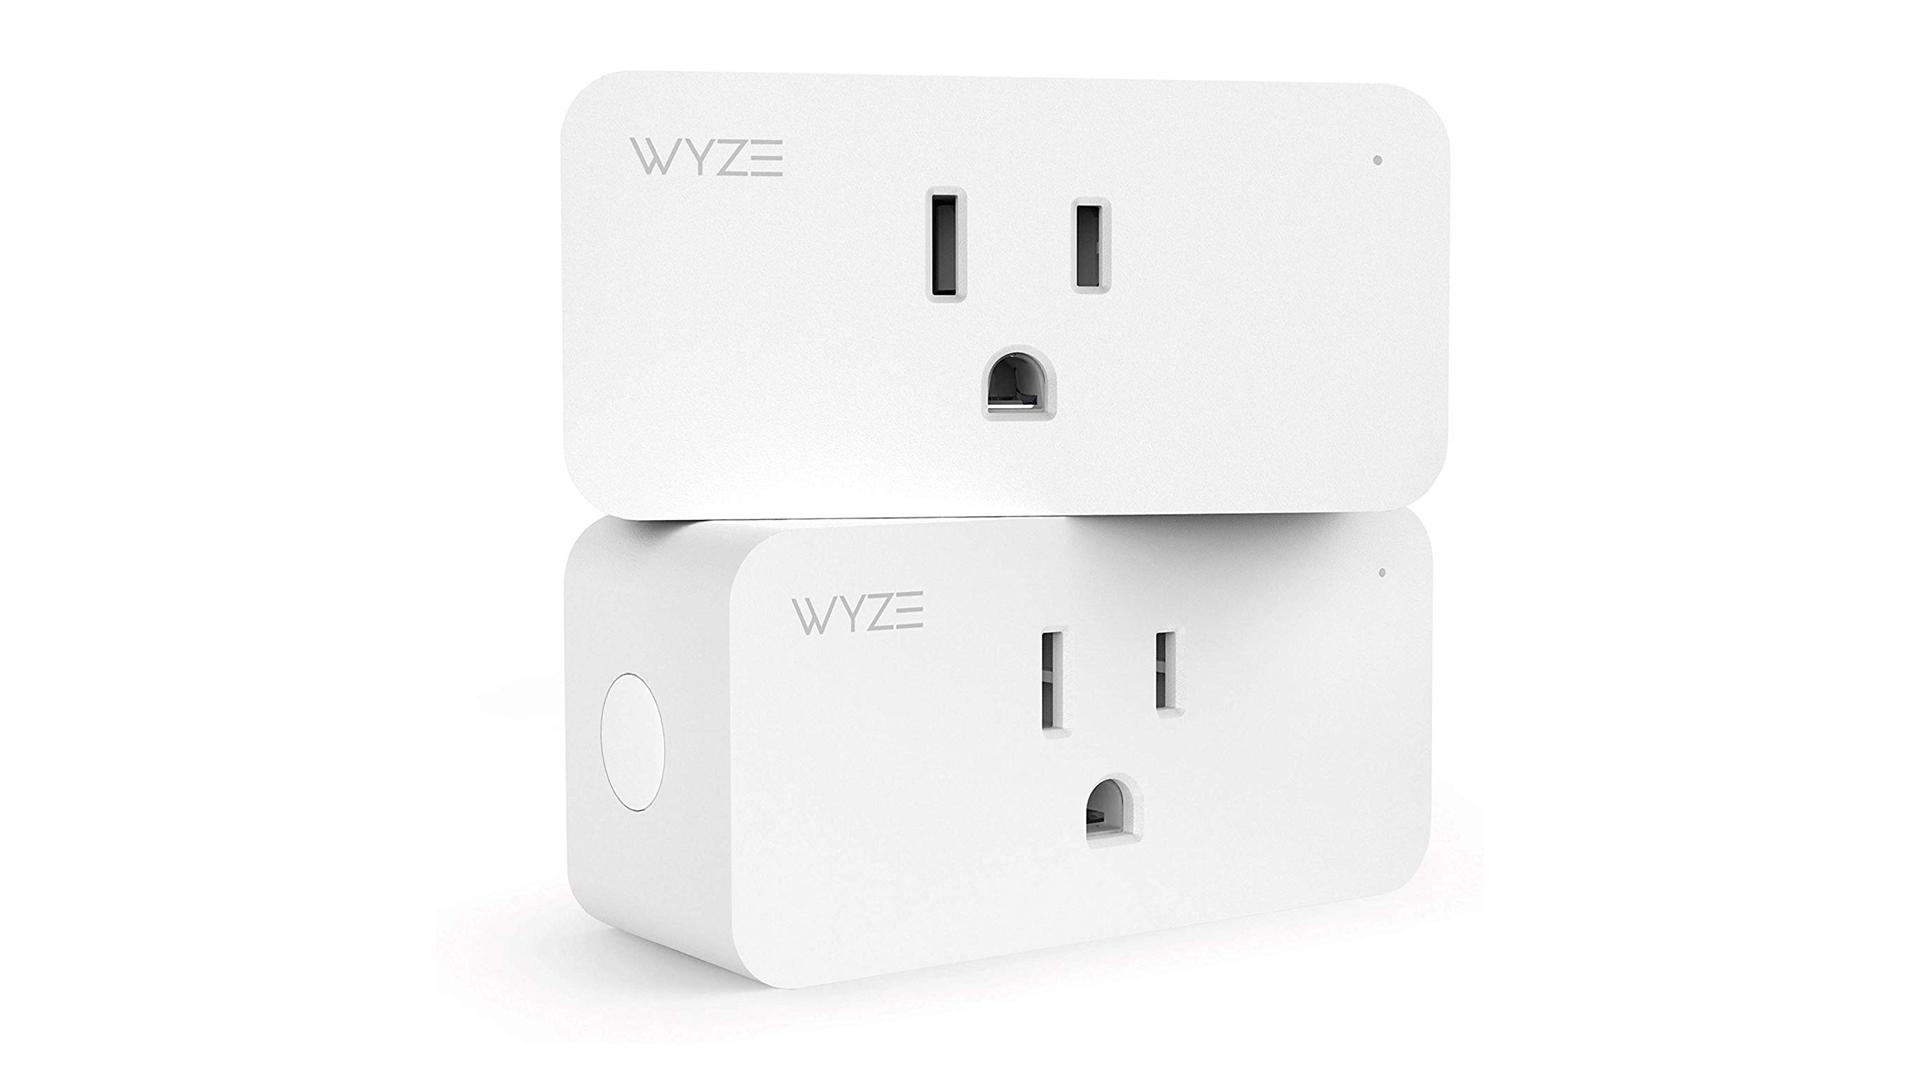 The Wyze Labs smart plug.